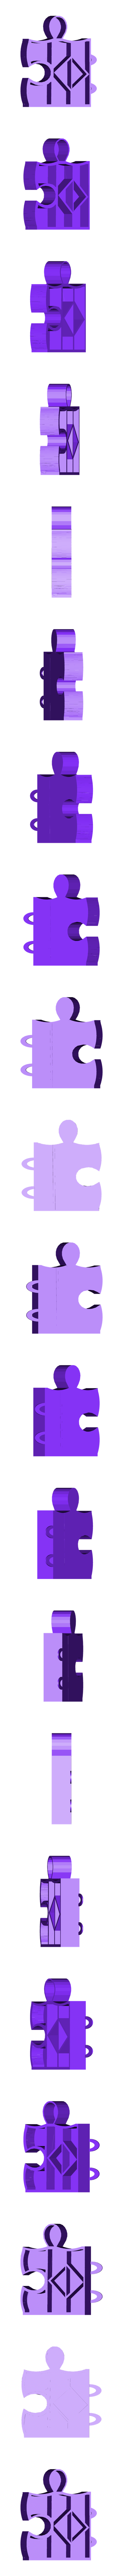 puzzle new 4 accroche.stl Download STL file PUZZLE SHELVES • 3D print model, catf3d